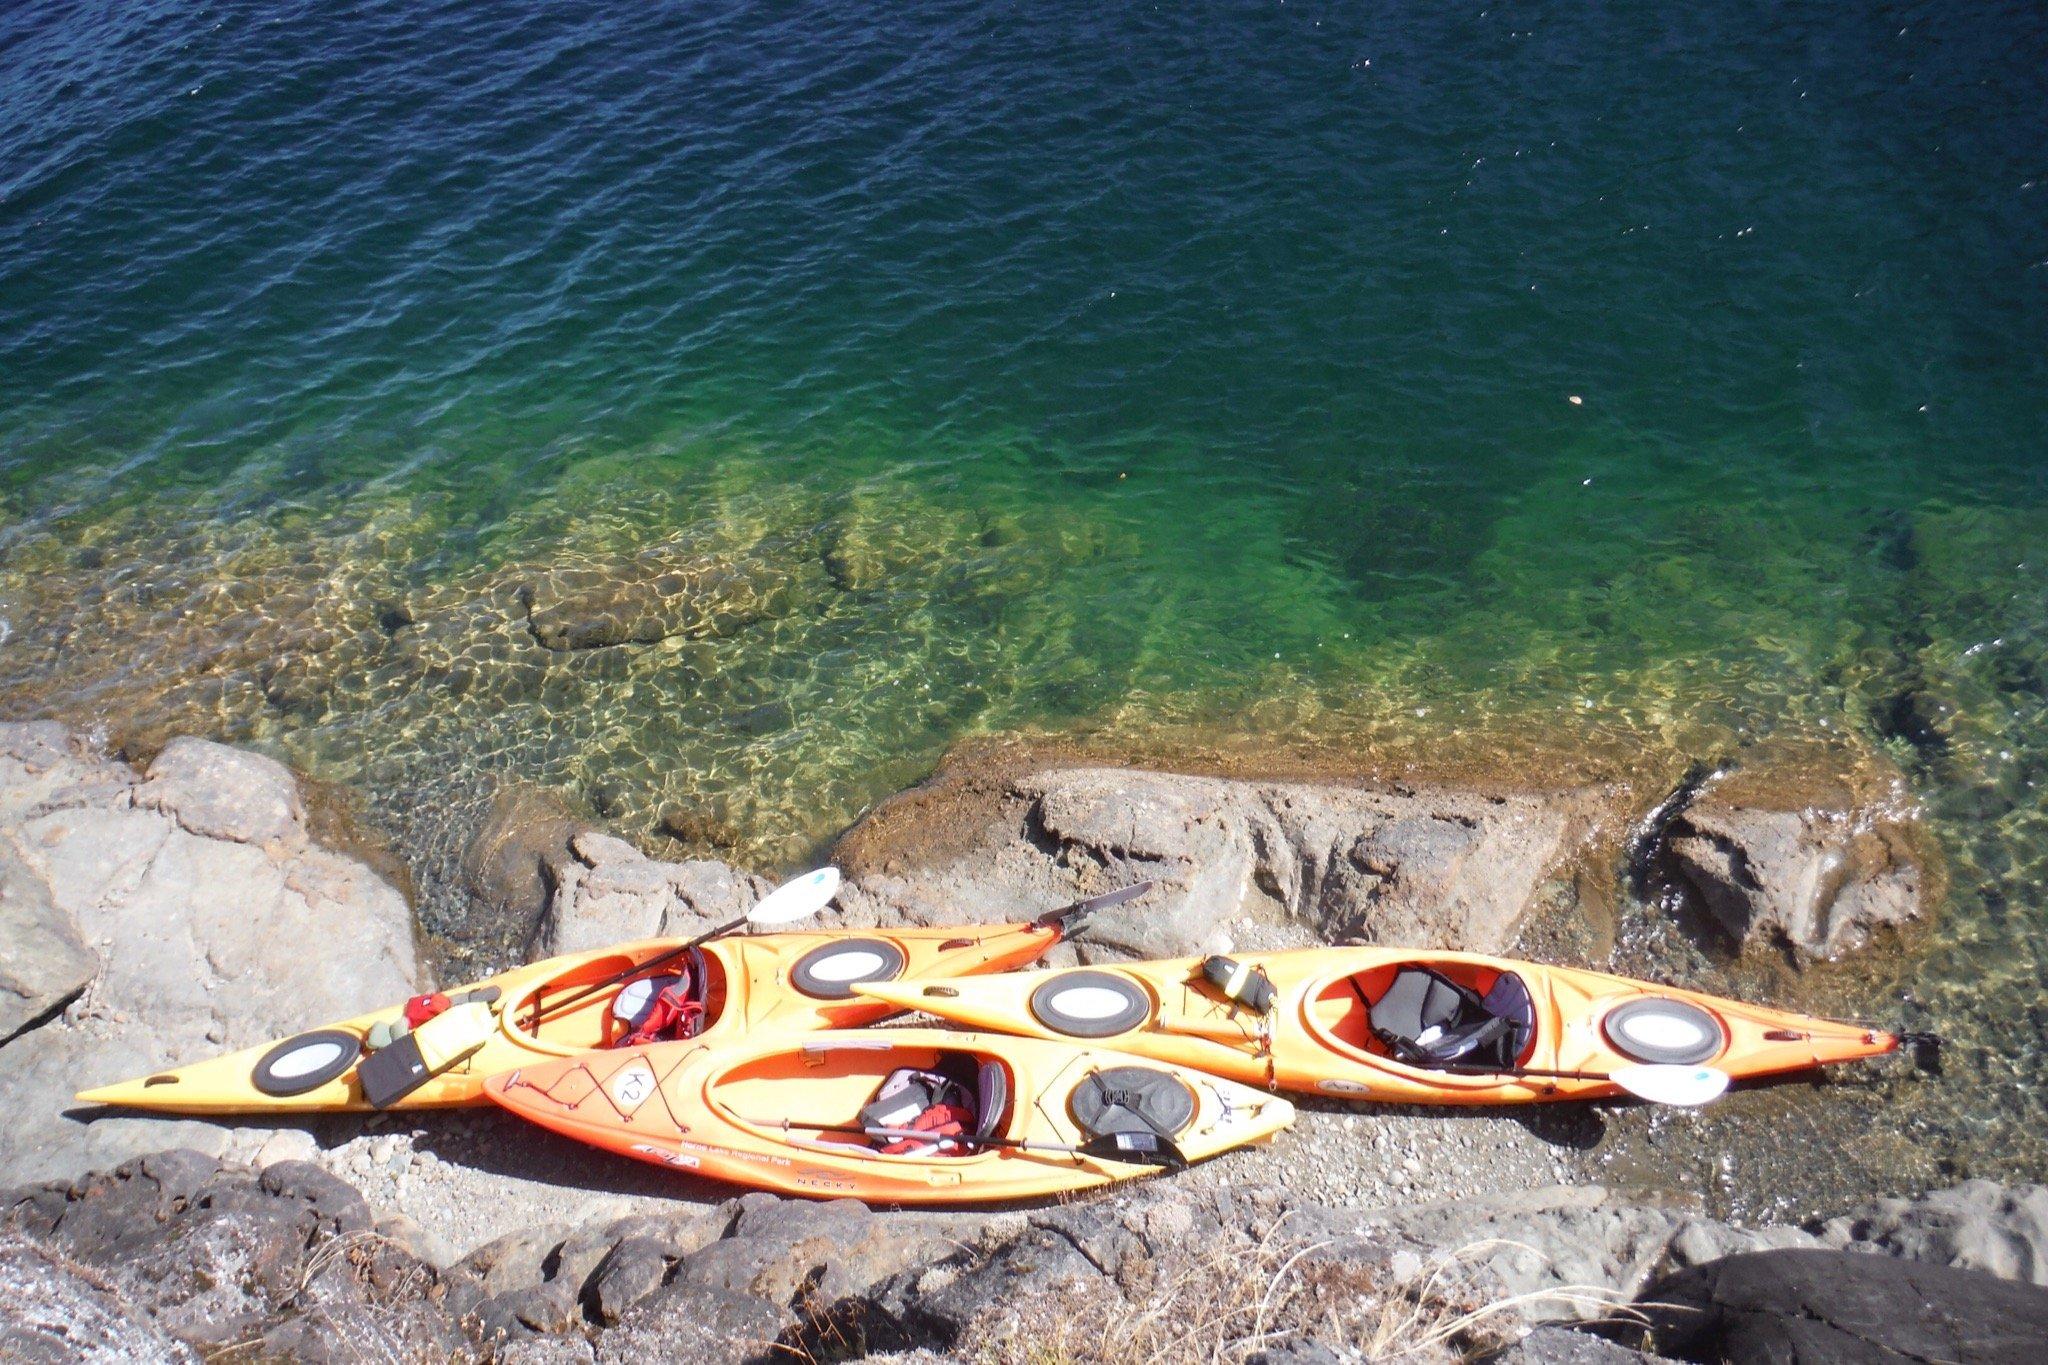 Horne Lake Regional Park Campground